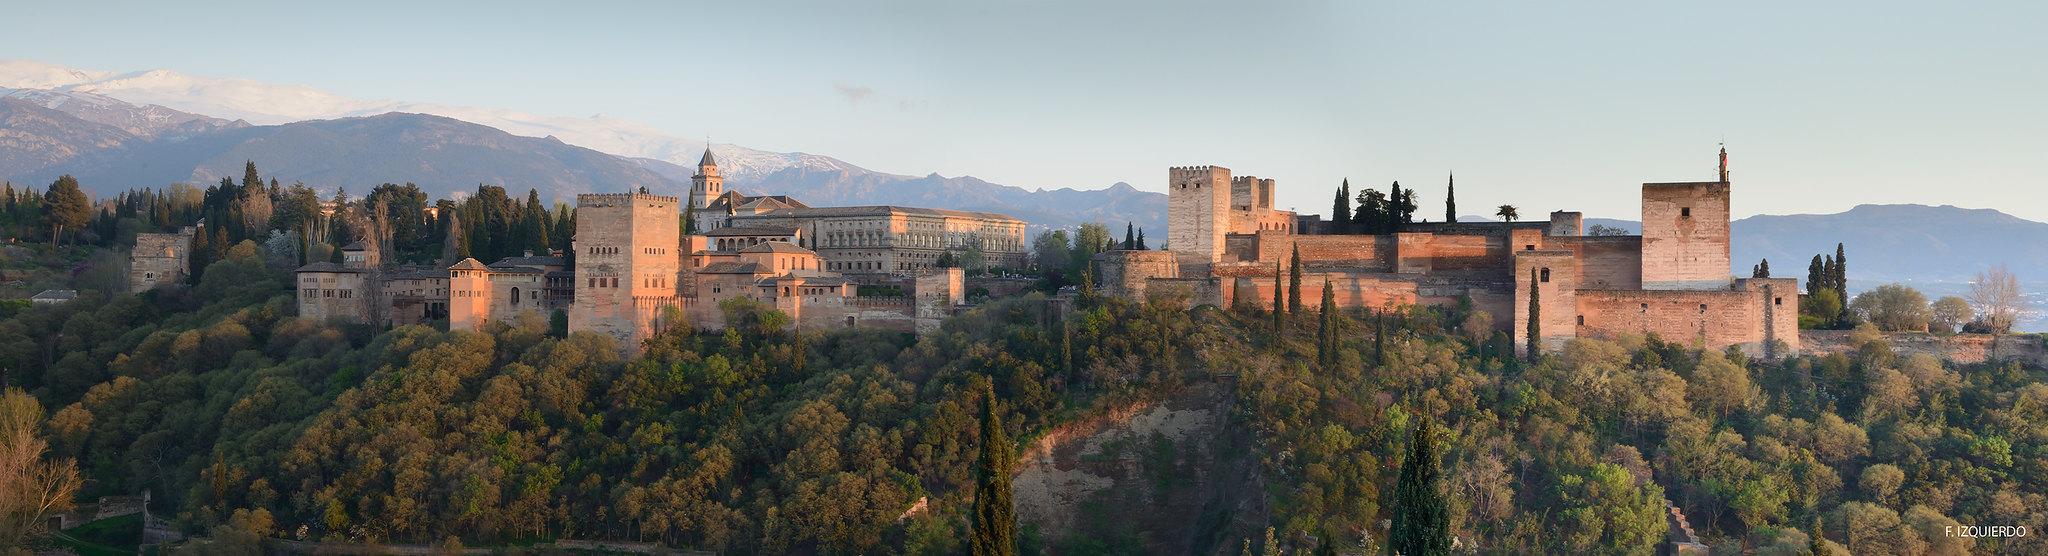 #Flickr12Days La Alhambra